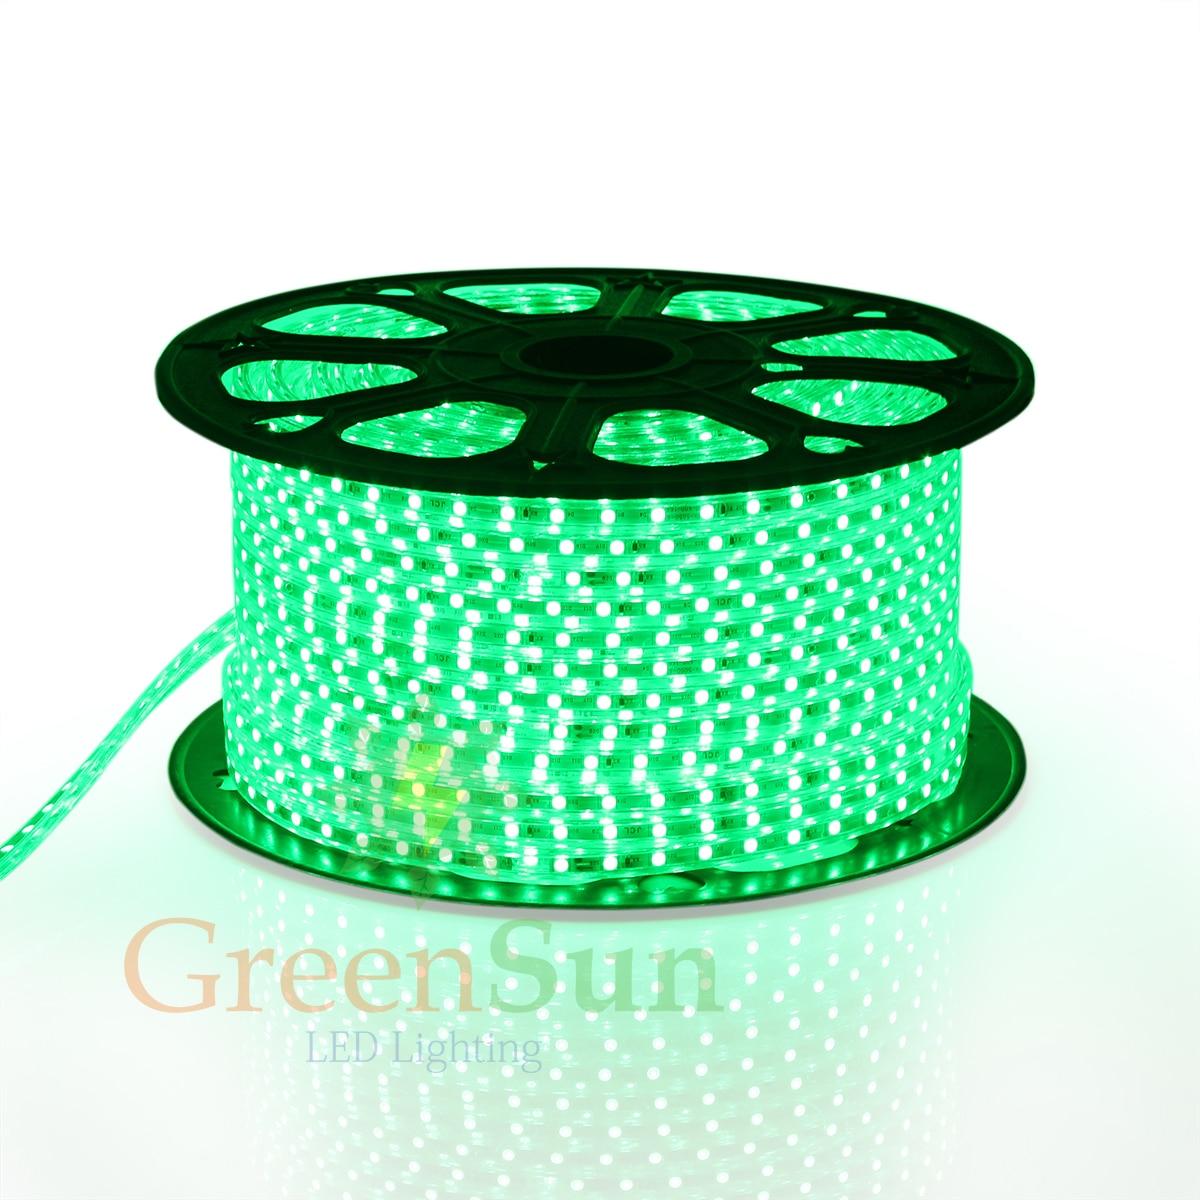 Green LED Strip Light 20-100M 60 LEDs/ meter Ultra Bright 5050 SMD LED Outdoor Garden Home Strip Rope Light Waterproof 0 9m smd 3528 90 leds waterproof led rope light festival lighting